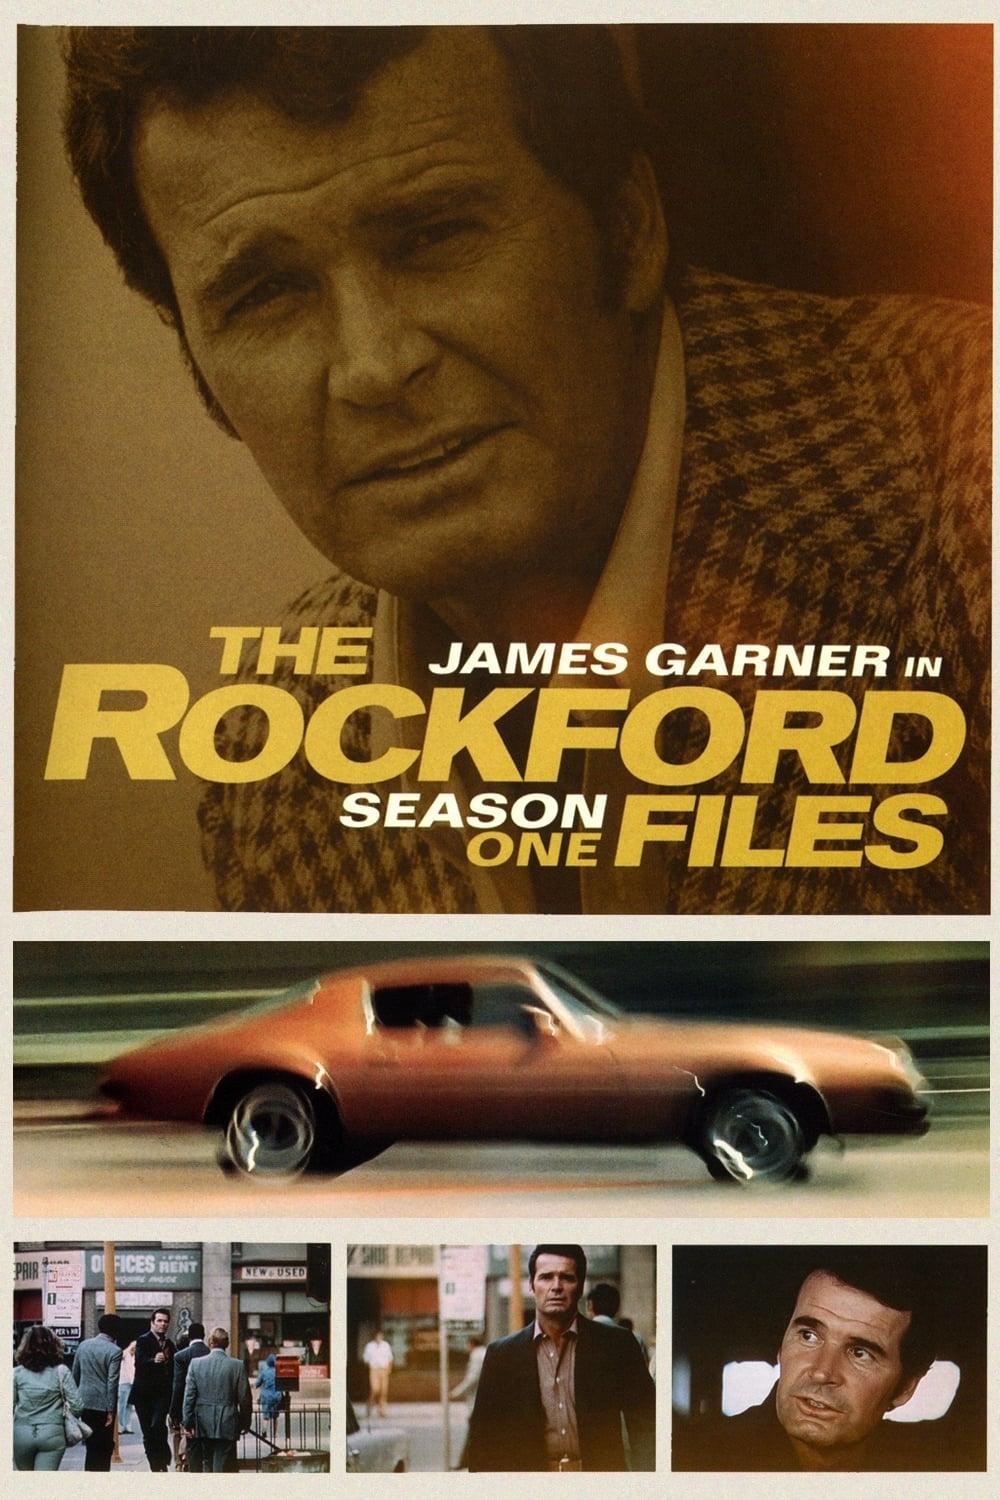 The Rockford Files Season 1